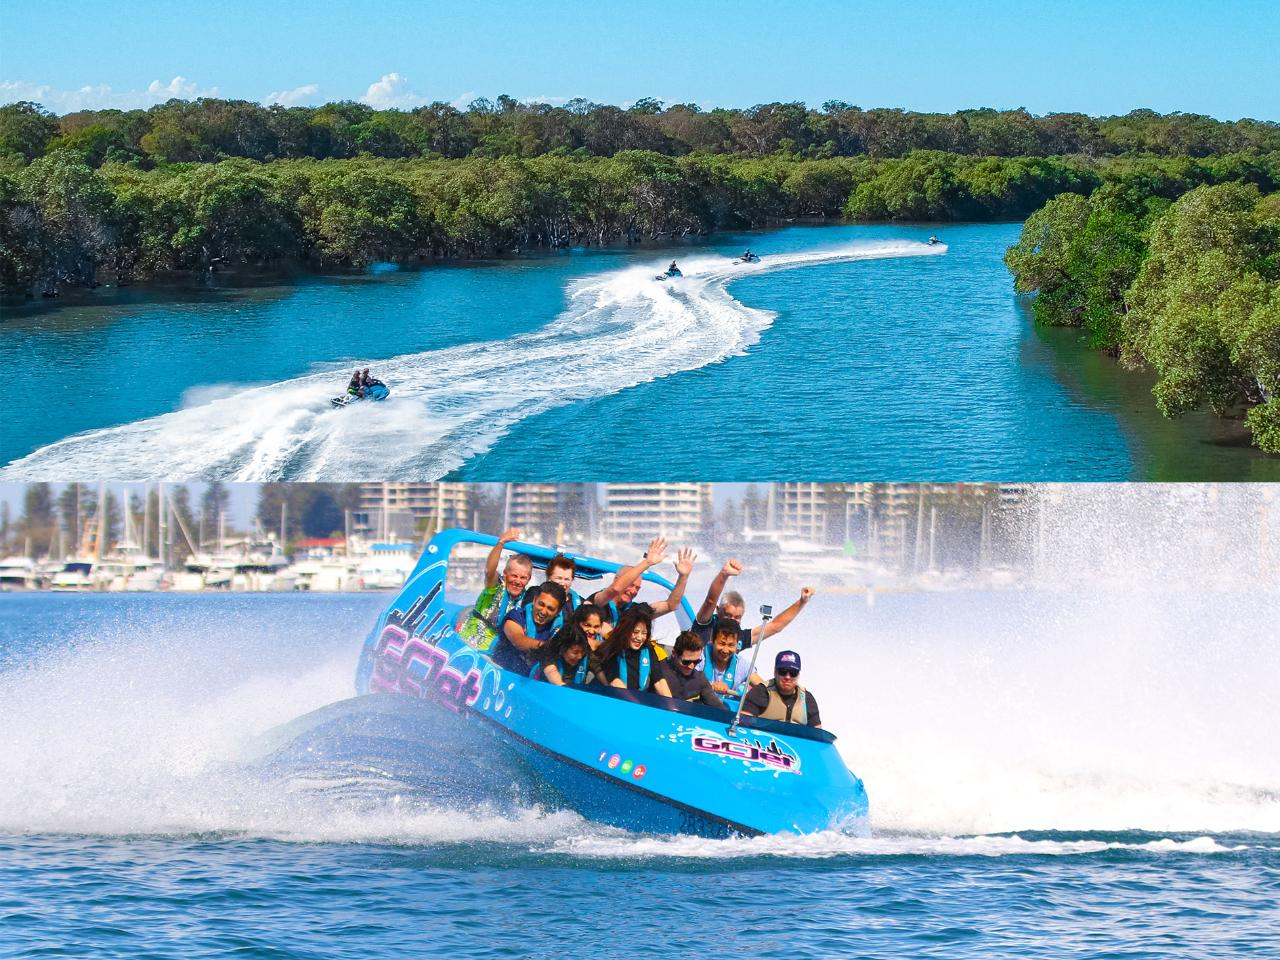 Jet boat & Jet Ski 1.5 hour - 2 Adults